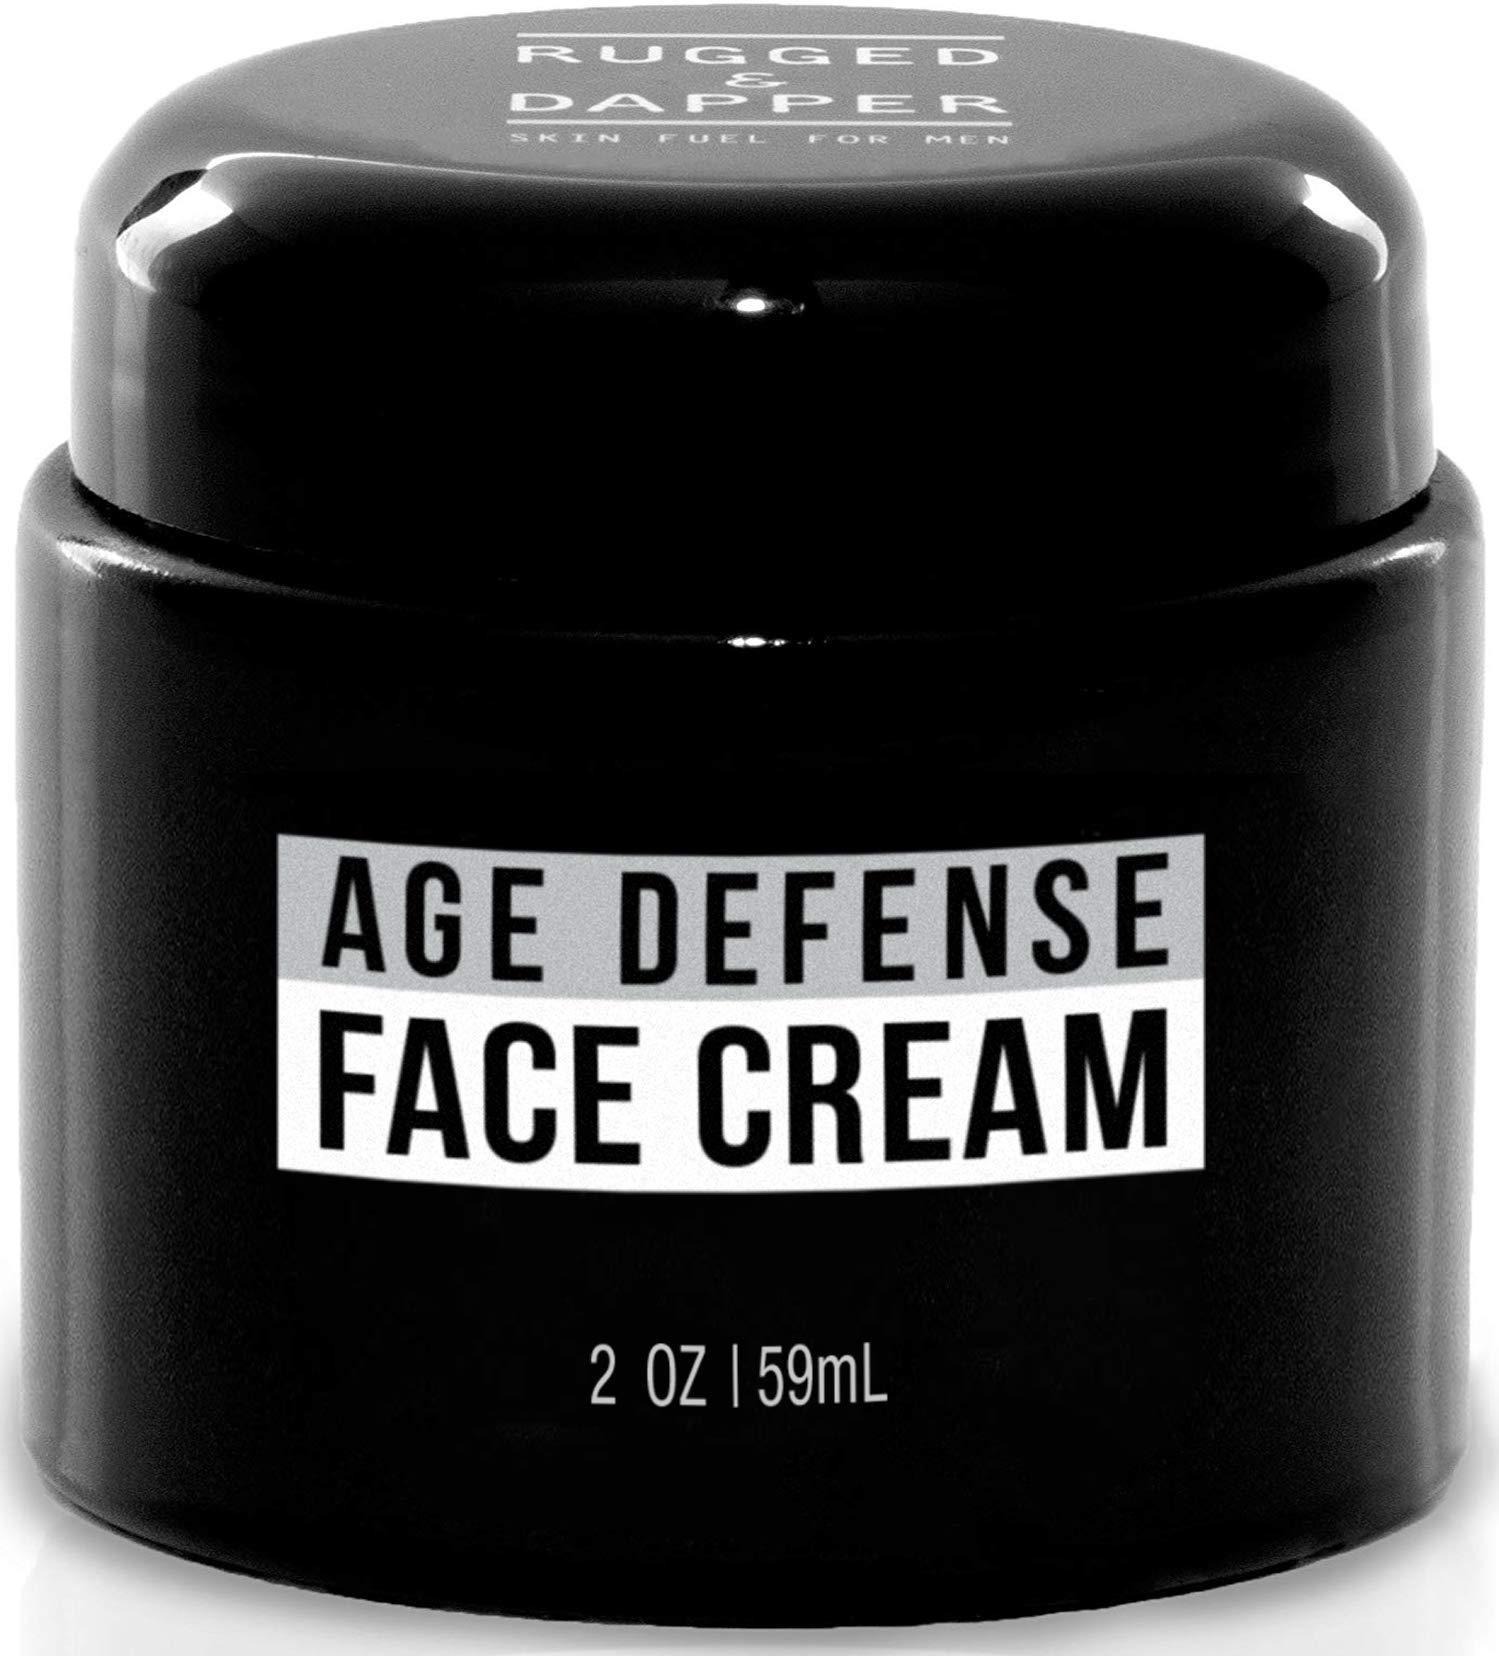 RUGGED & DAPPER Face Cream for Men, Anti-Aging Day and Night Cream, 2 Oz by RUGGED & DAPPER